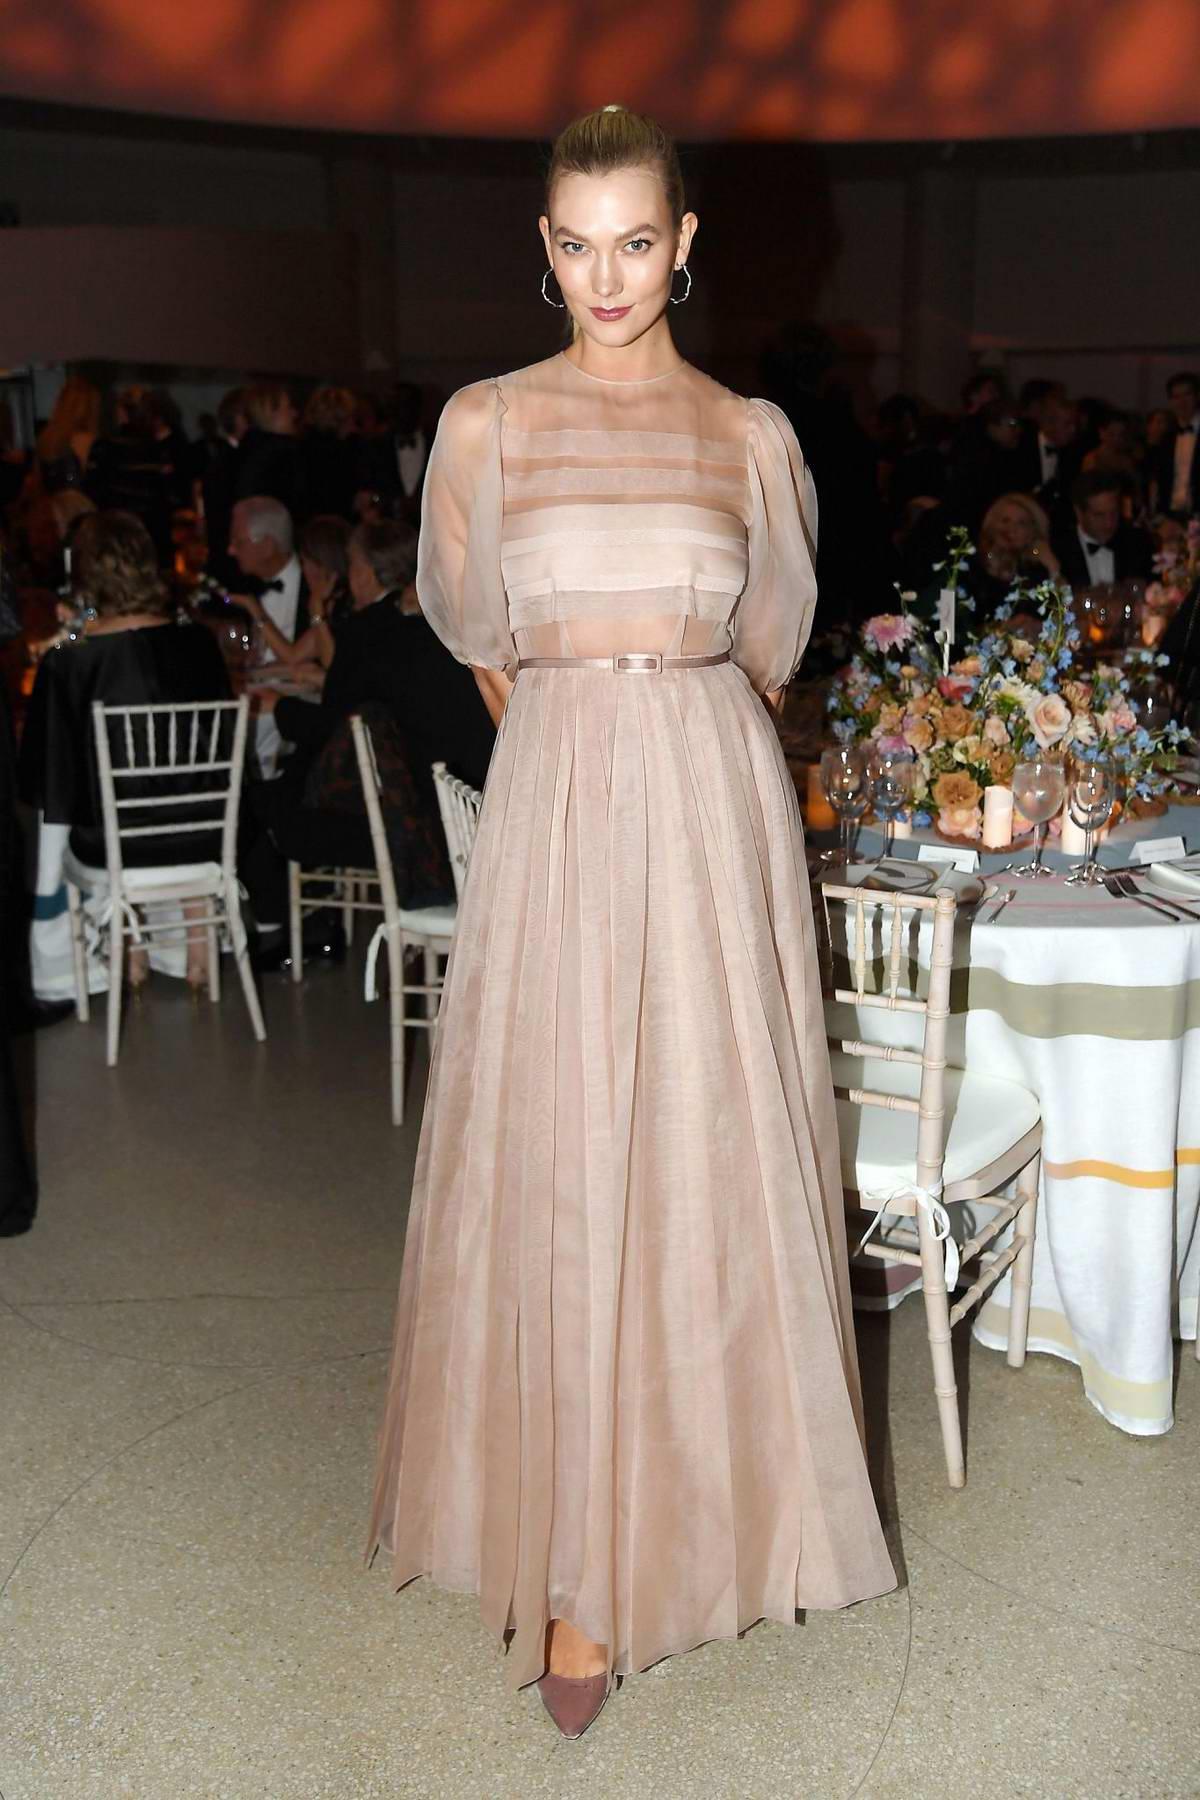 Karlie Kloss attends Guggenheim International Gala Dinner Hosted by Dior in New York City